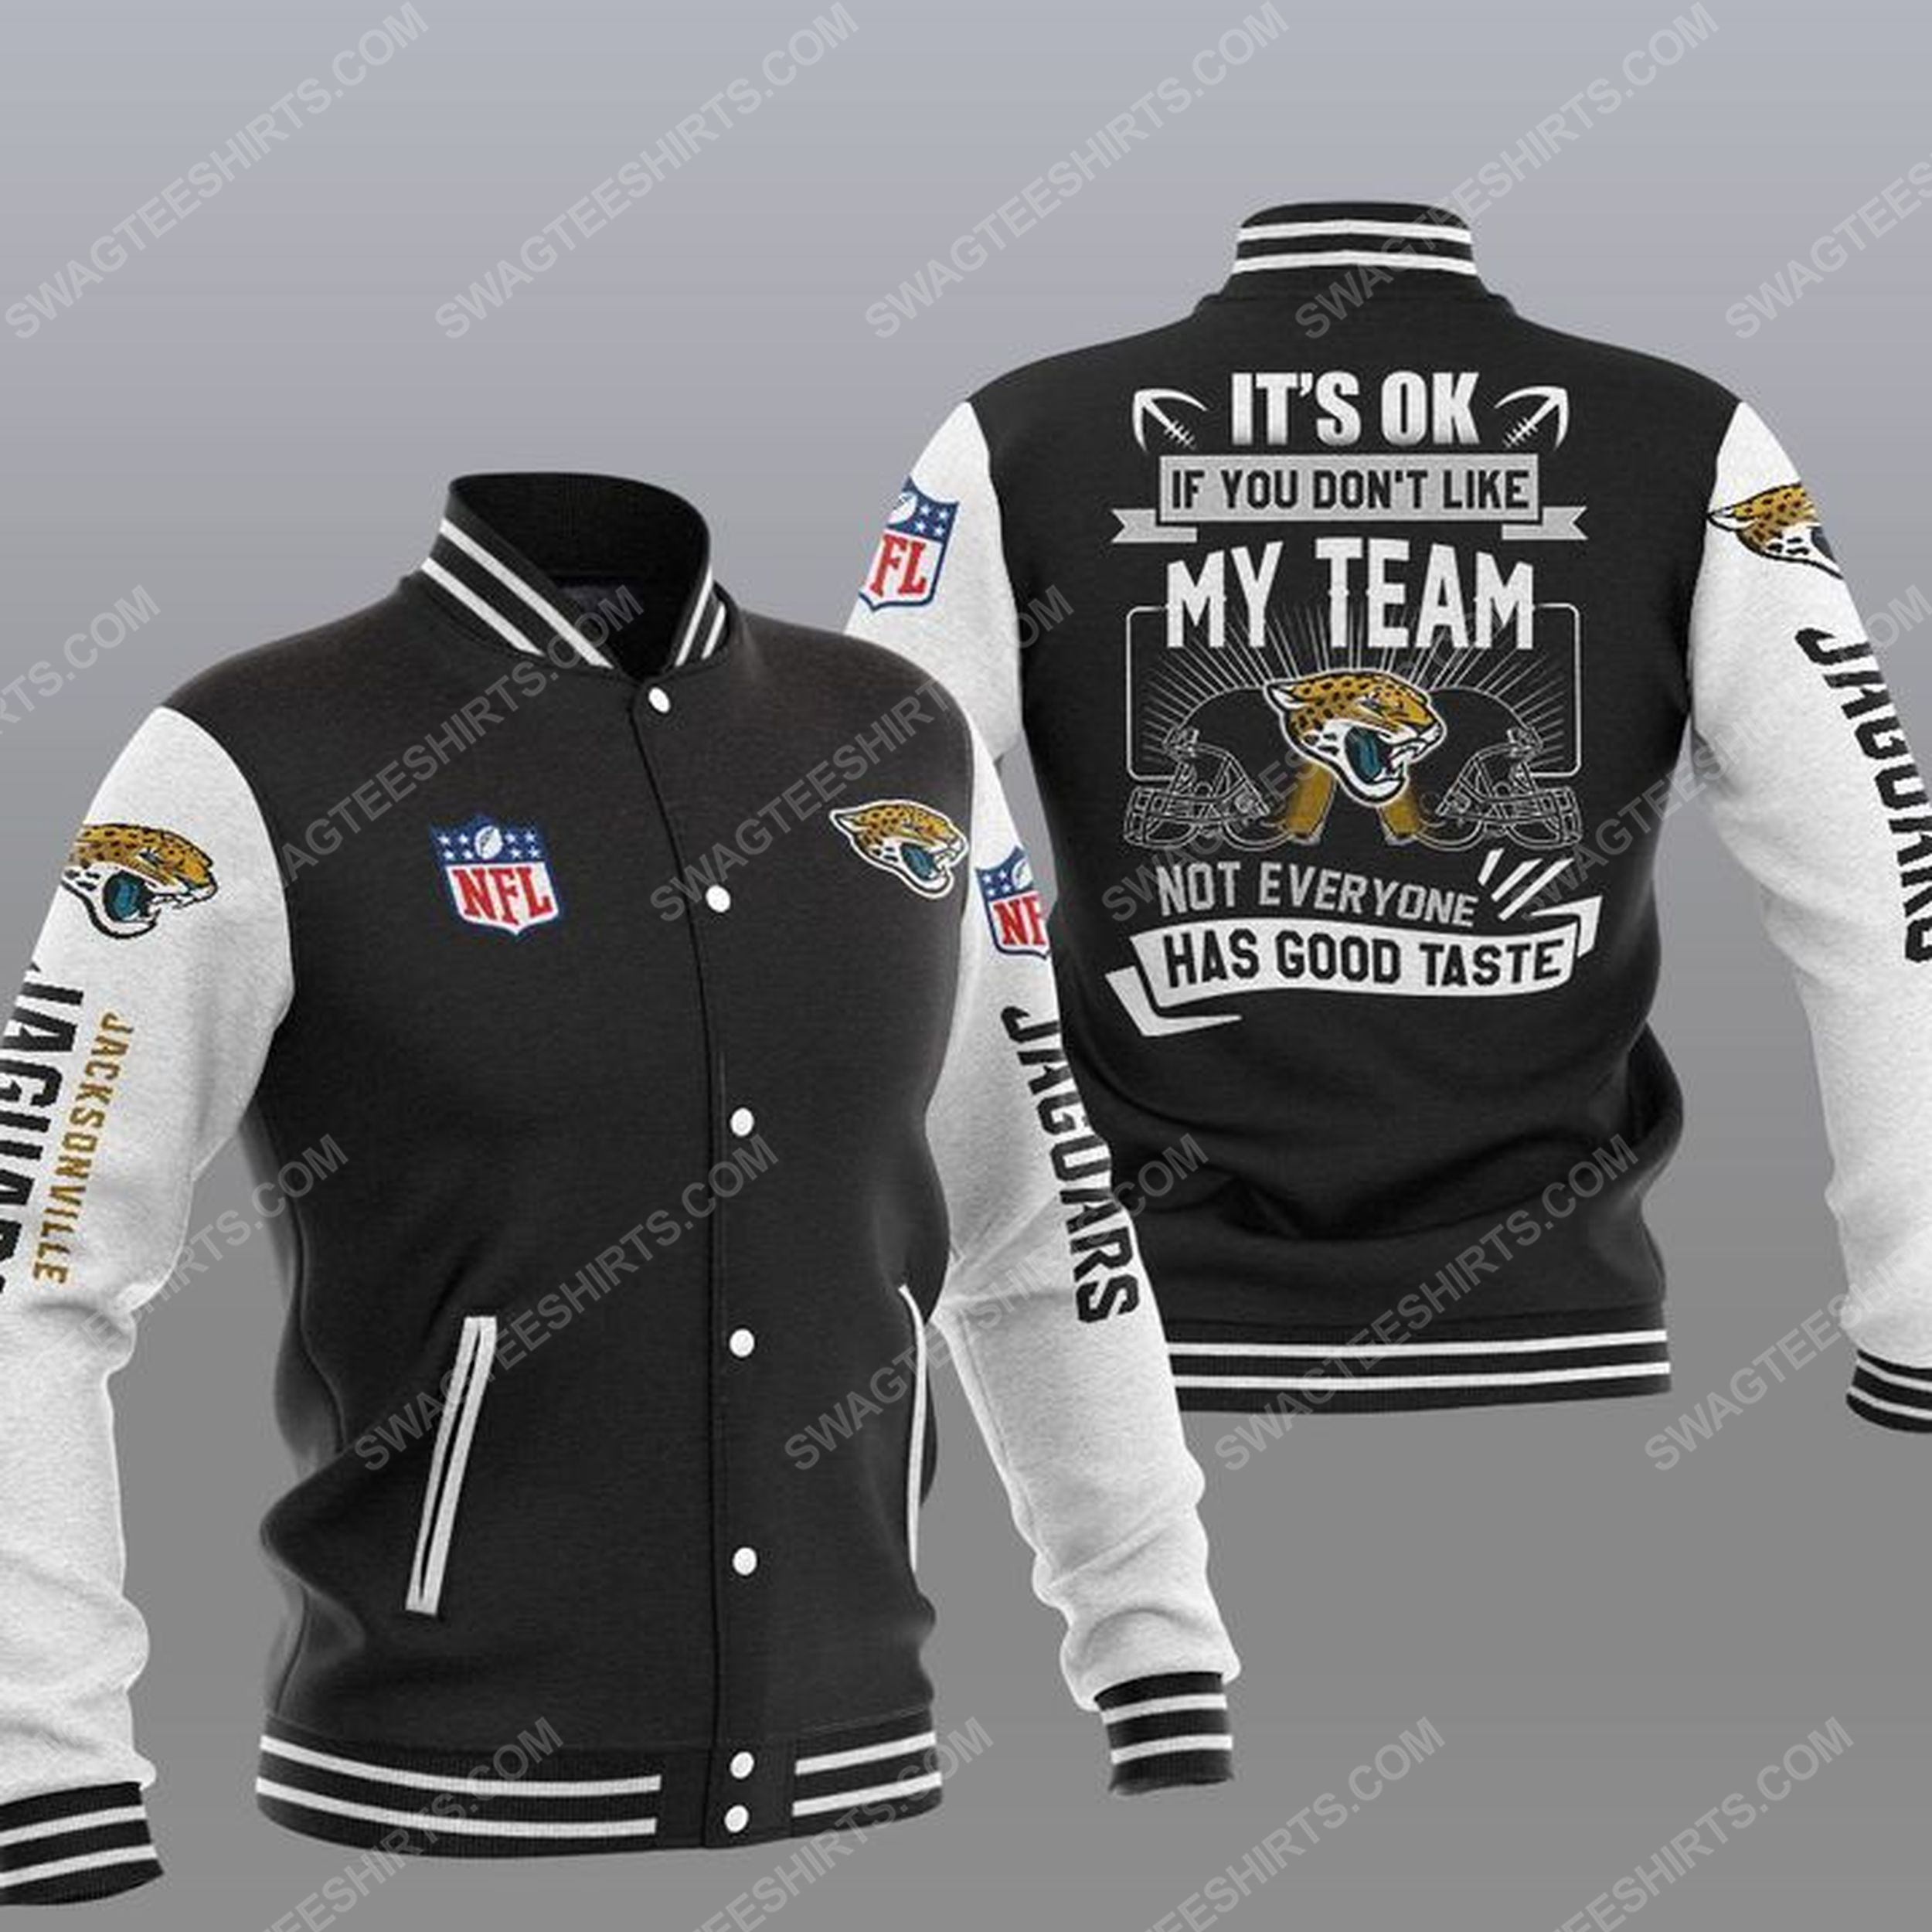 It's ok if you don't like my team jacksonville jaguars all over print baseball jacket - black 1